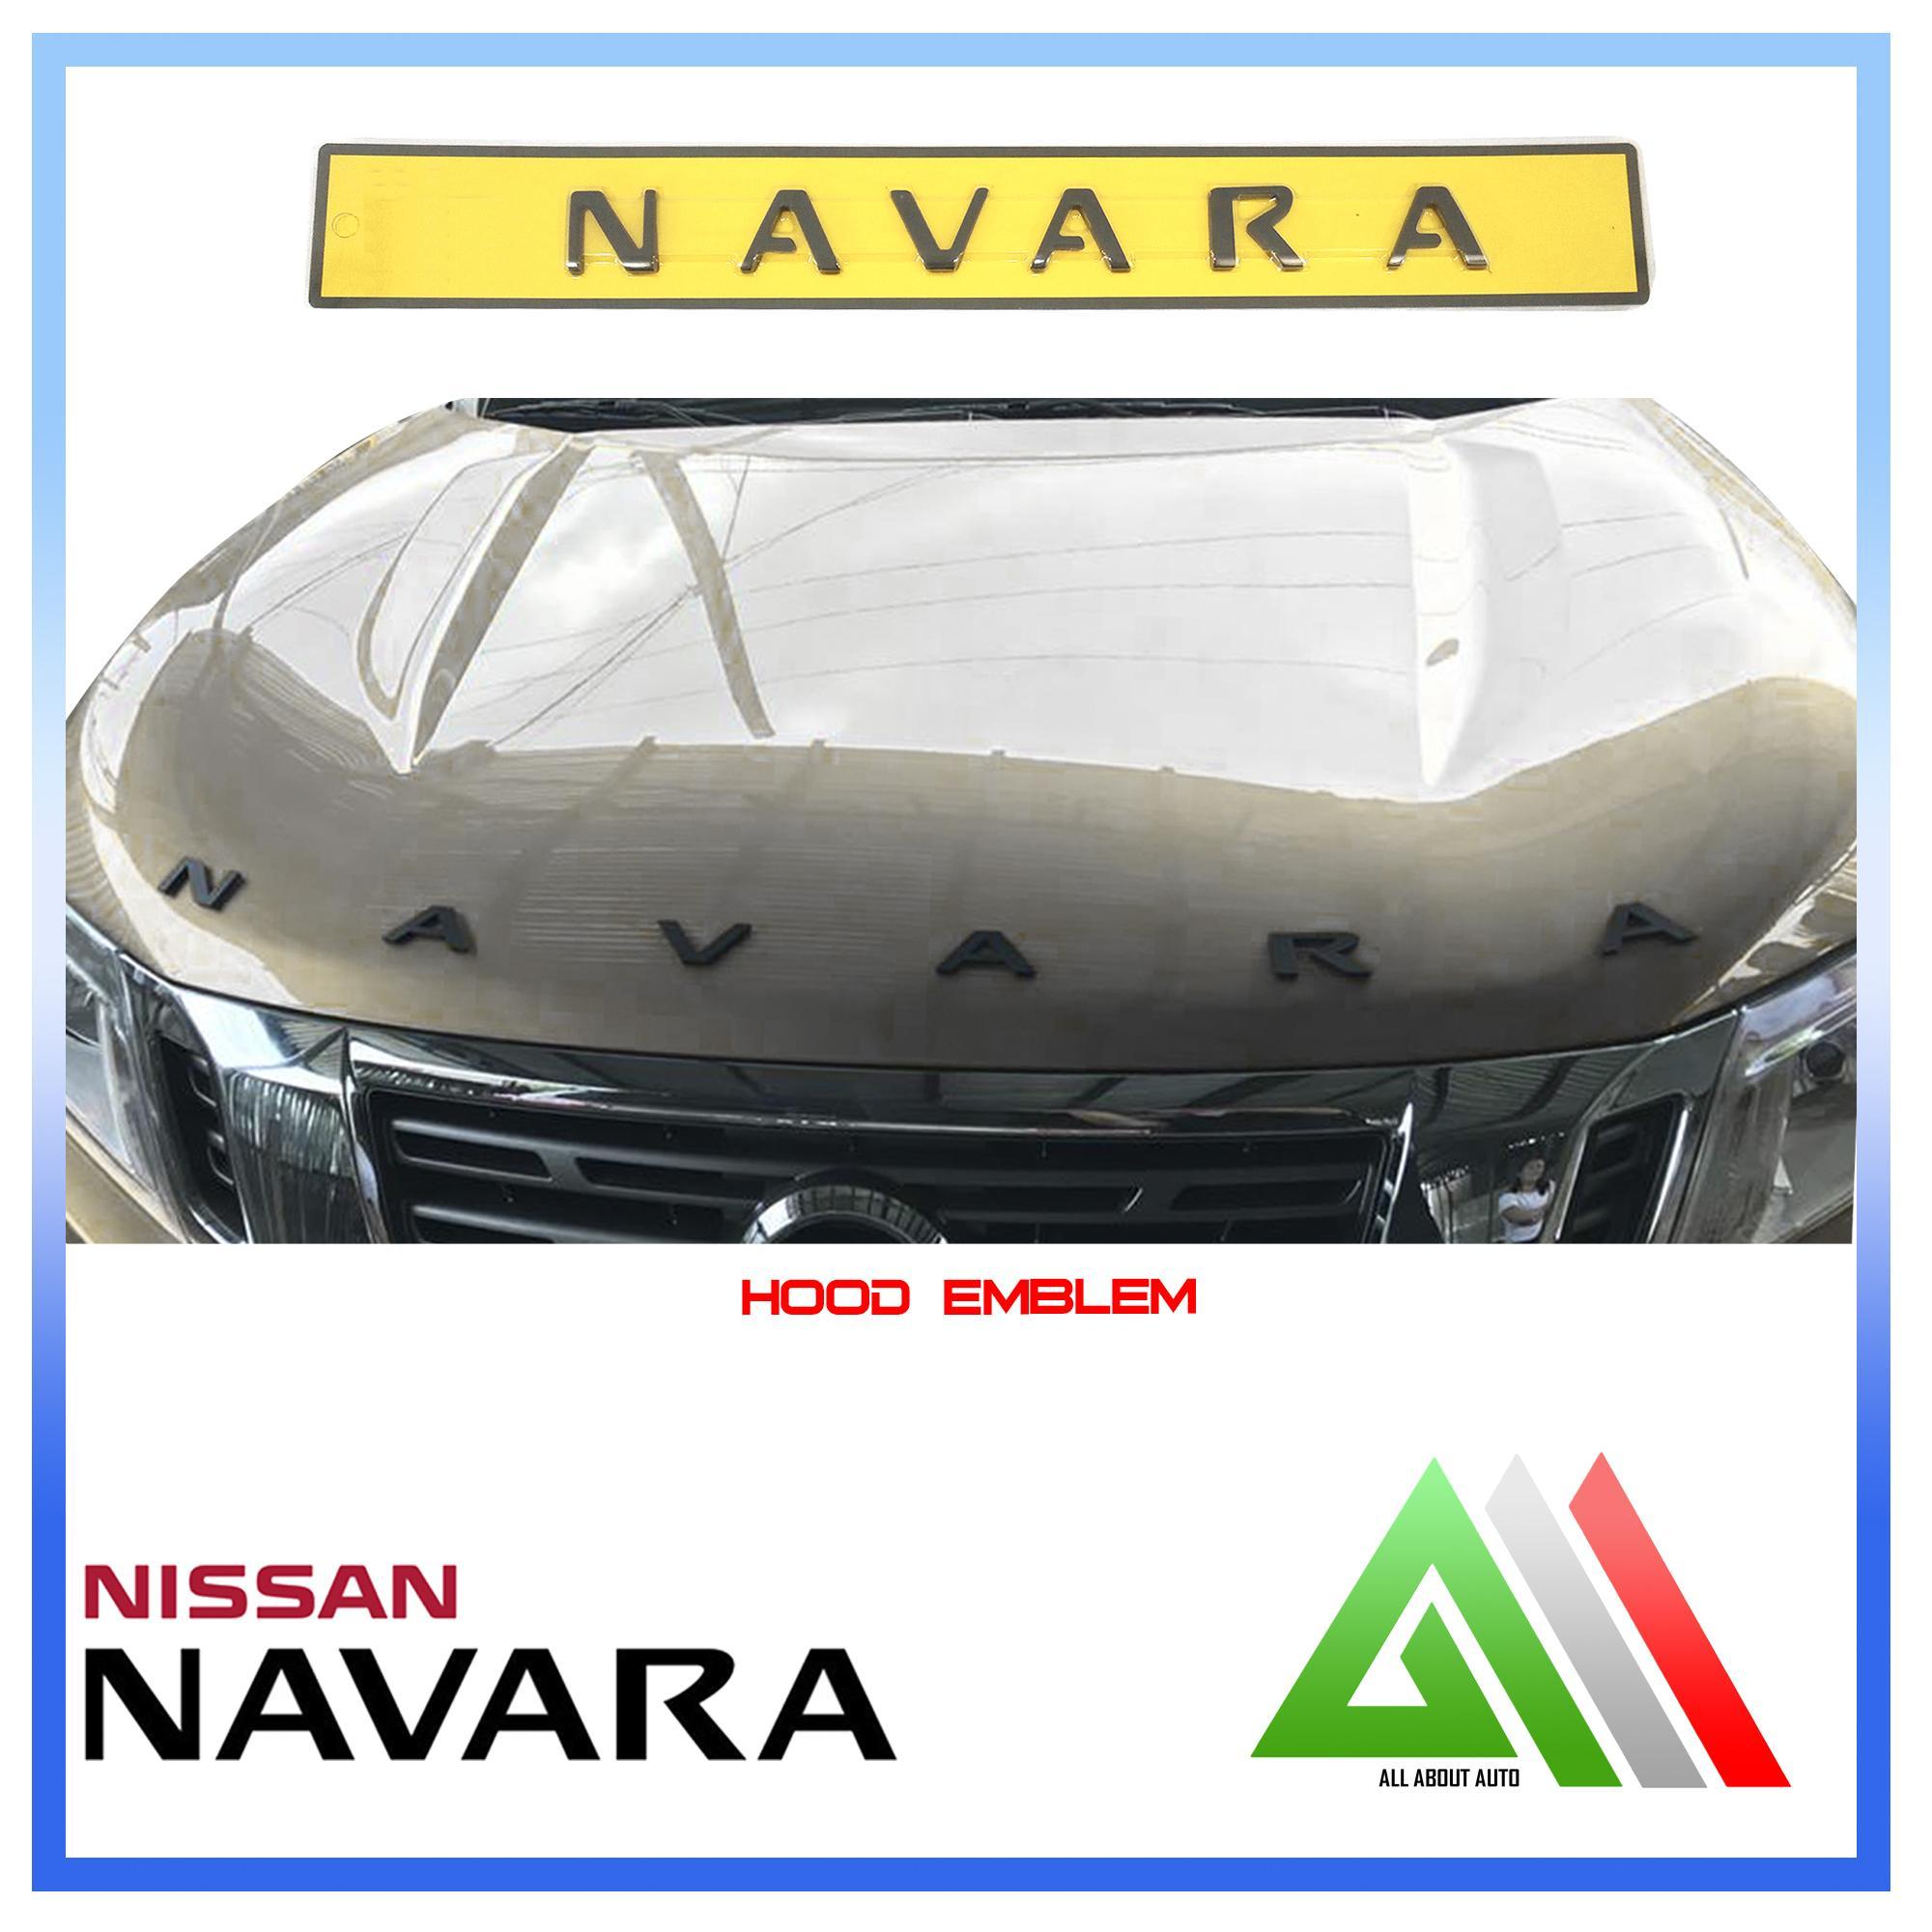 Hood Emblem for Nissan Navara (Matte Black)